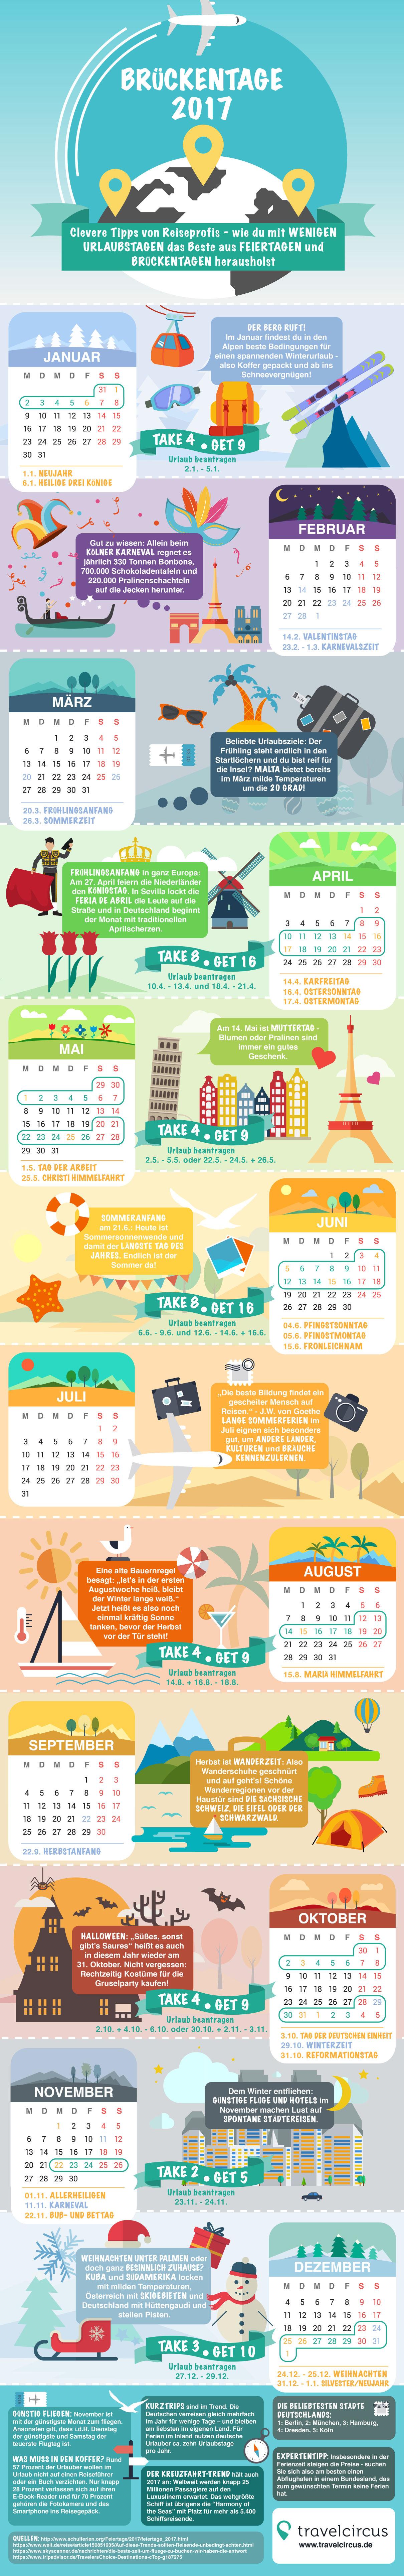 infografik-brueckentage-2017